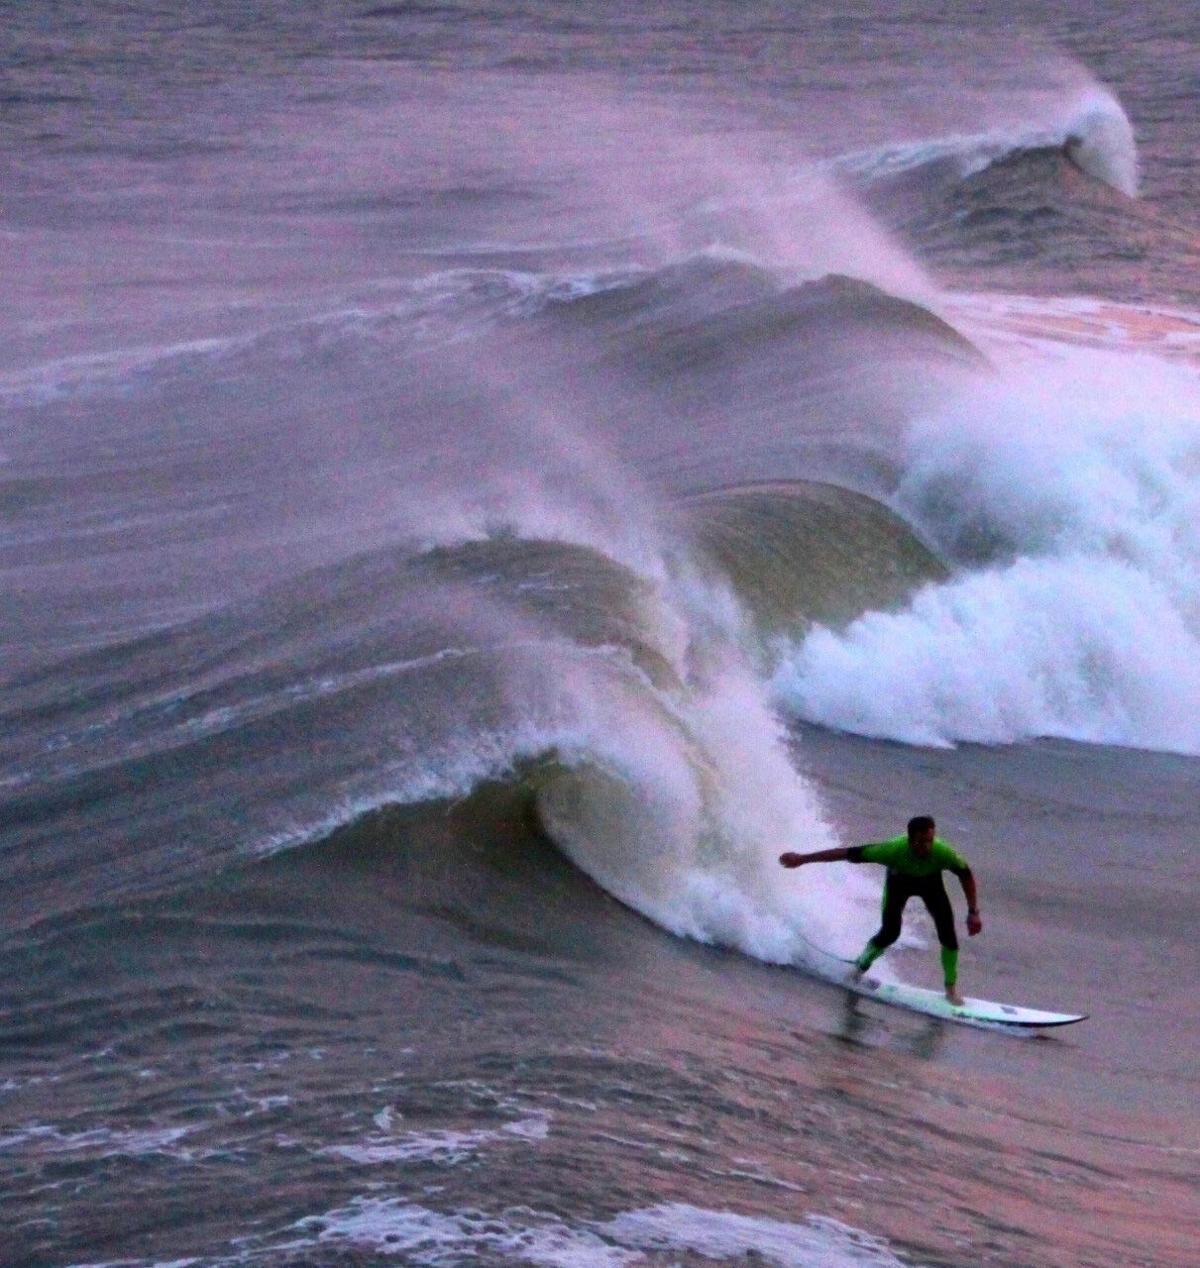 waves hammack.jpg